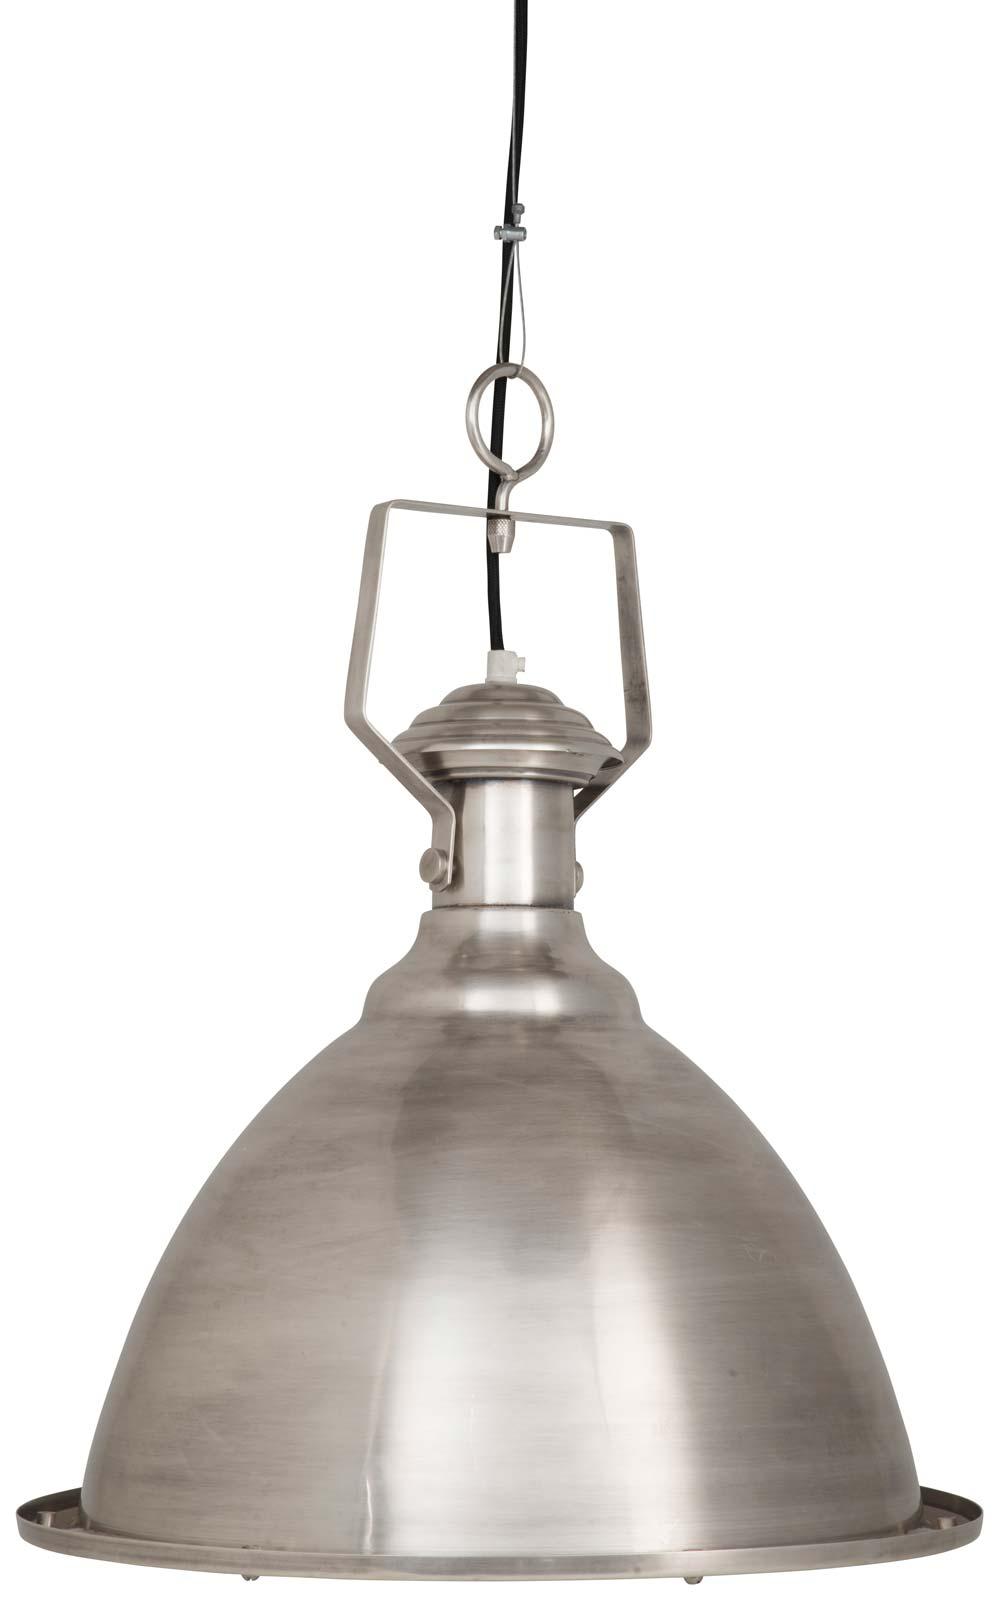 ib laursen Ib laursen hængelampe new york - sølv metal, stofledning fra boboonline.dk